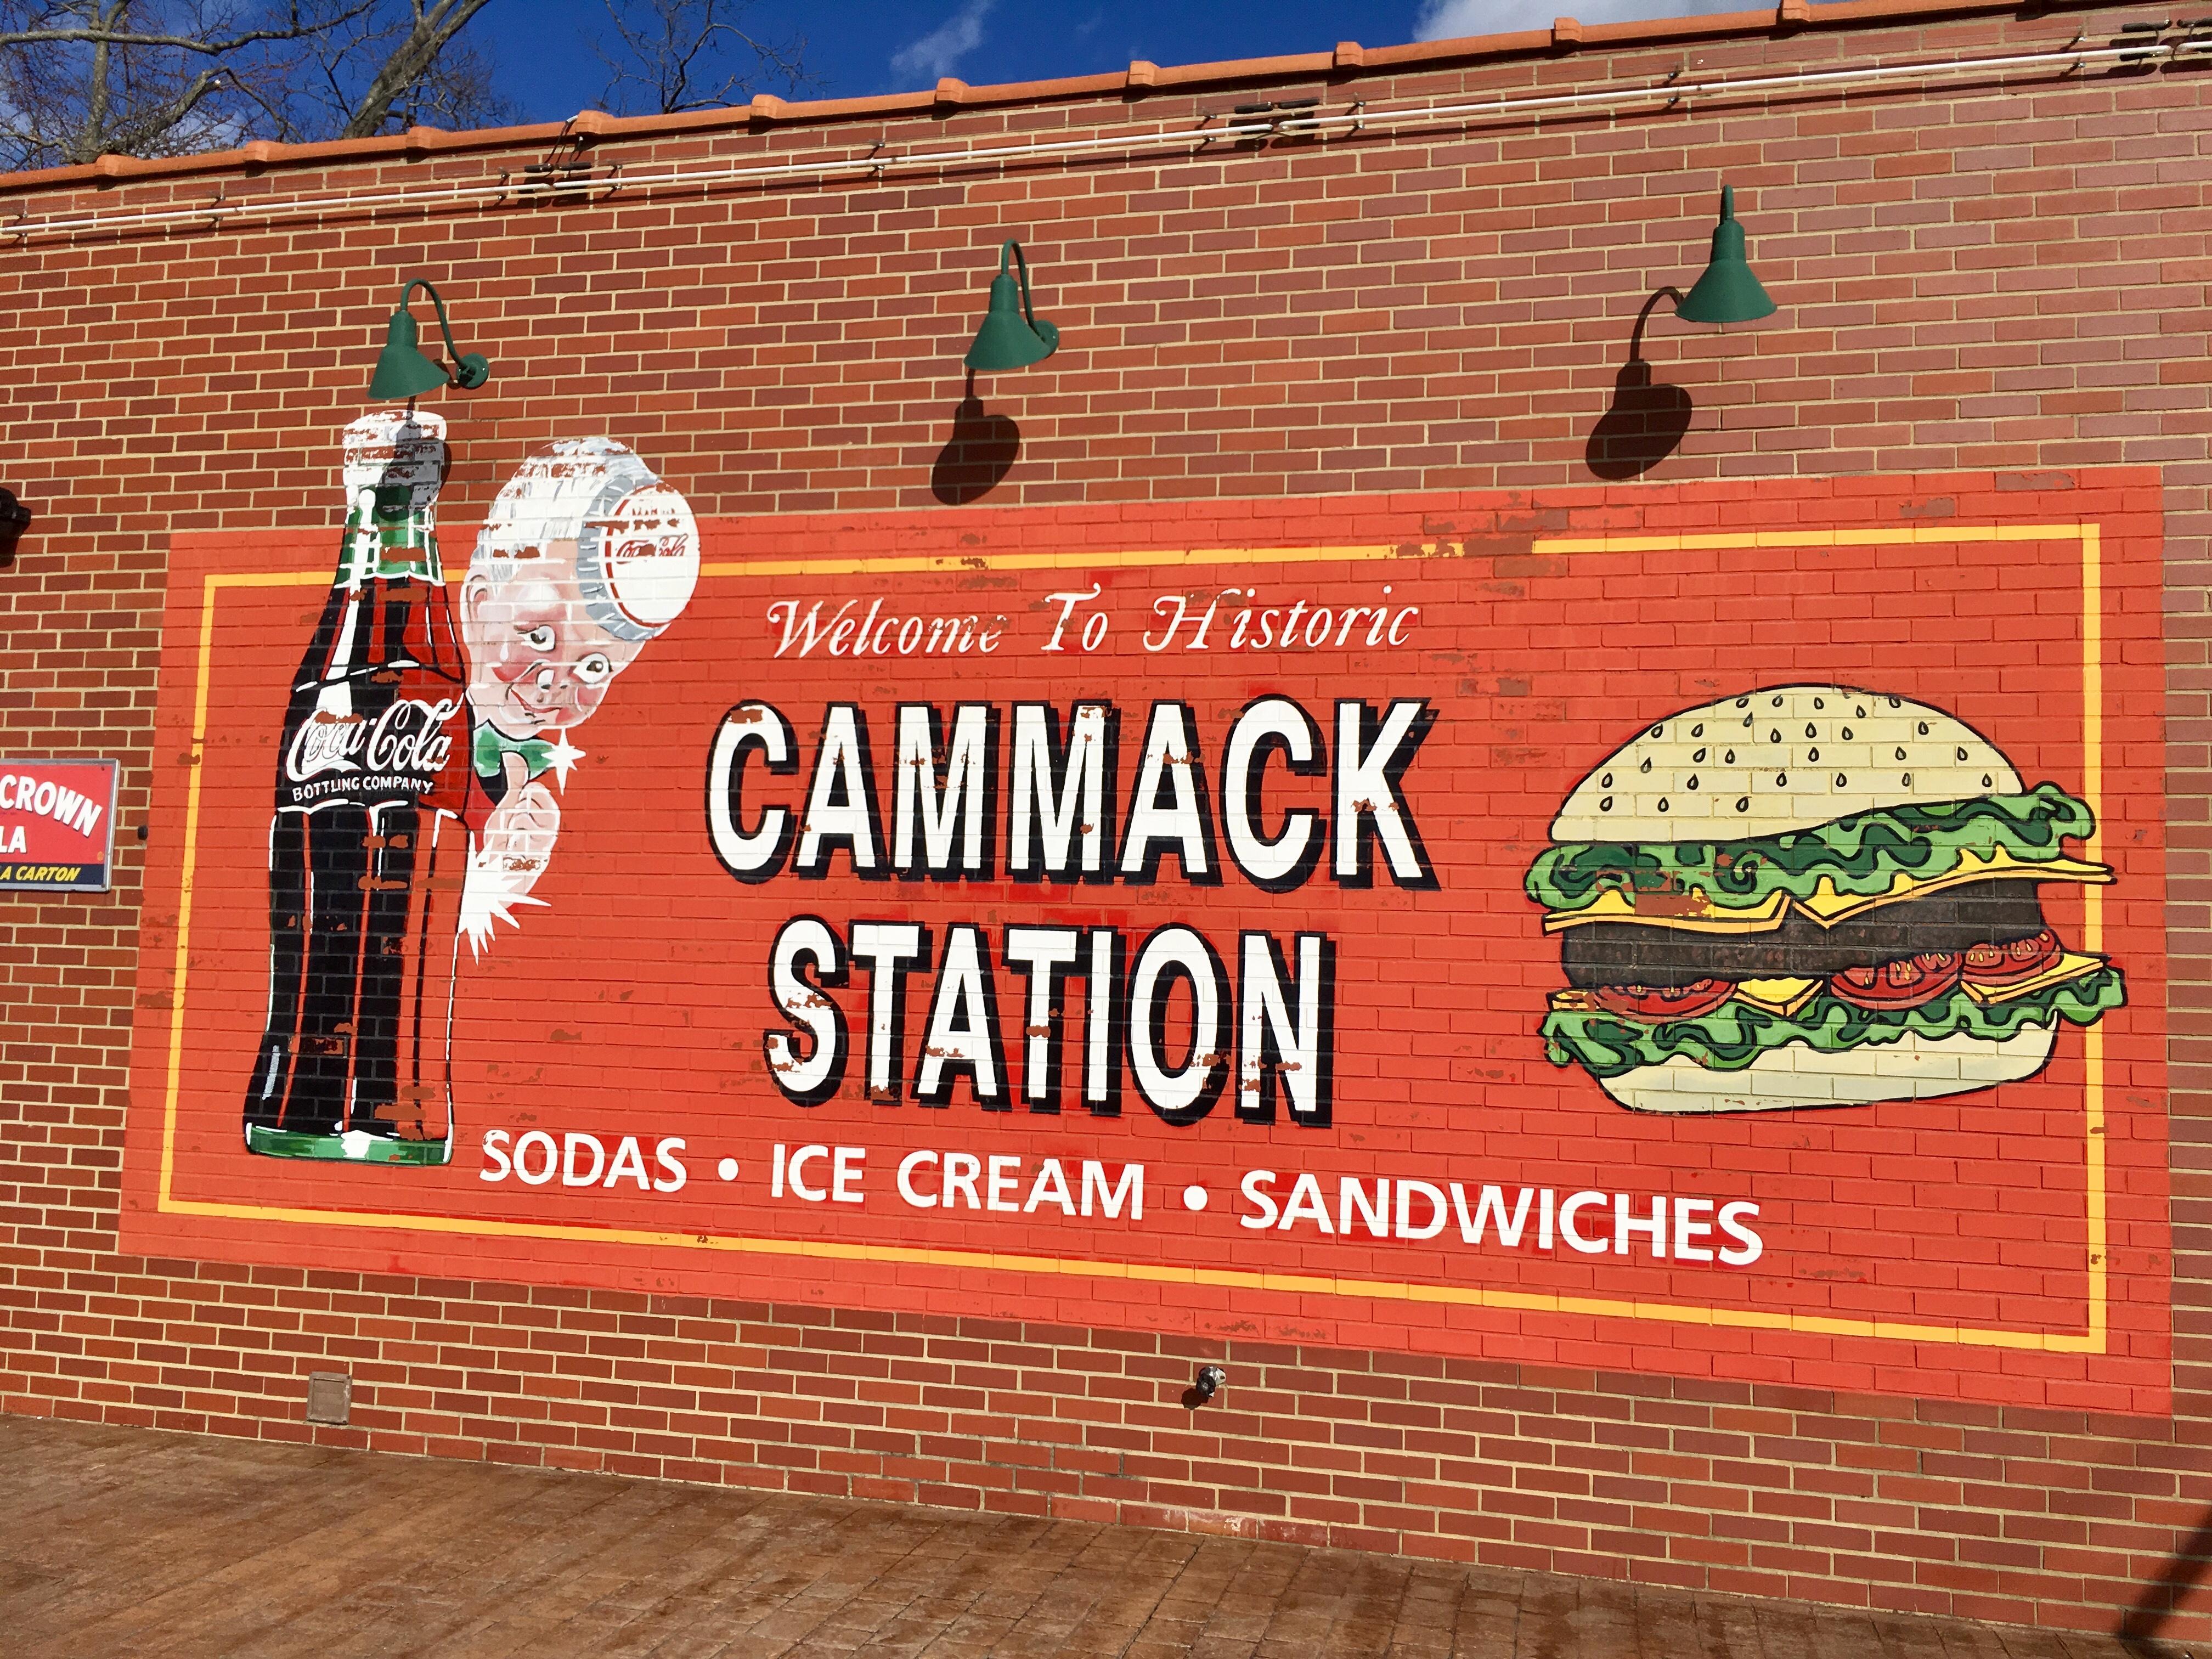 Cammack Station Restaurant in Muncie, Indiana